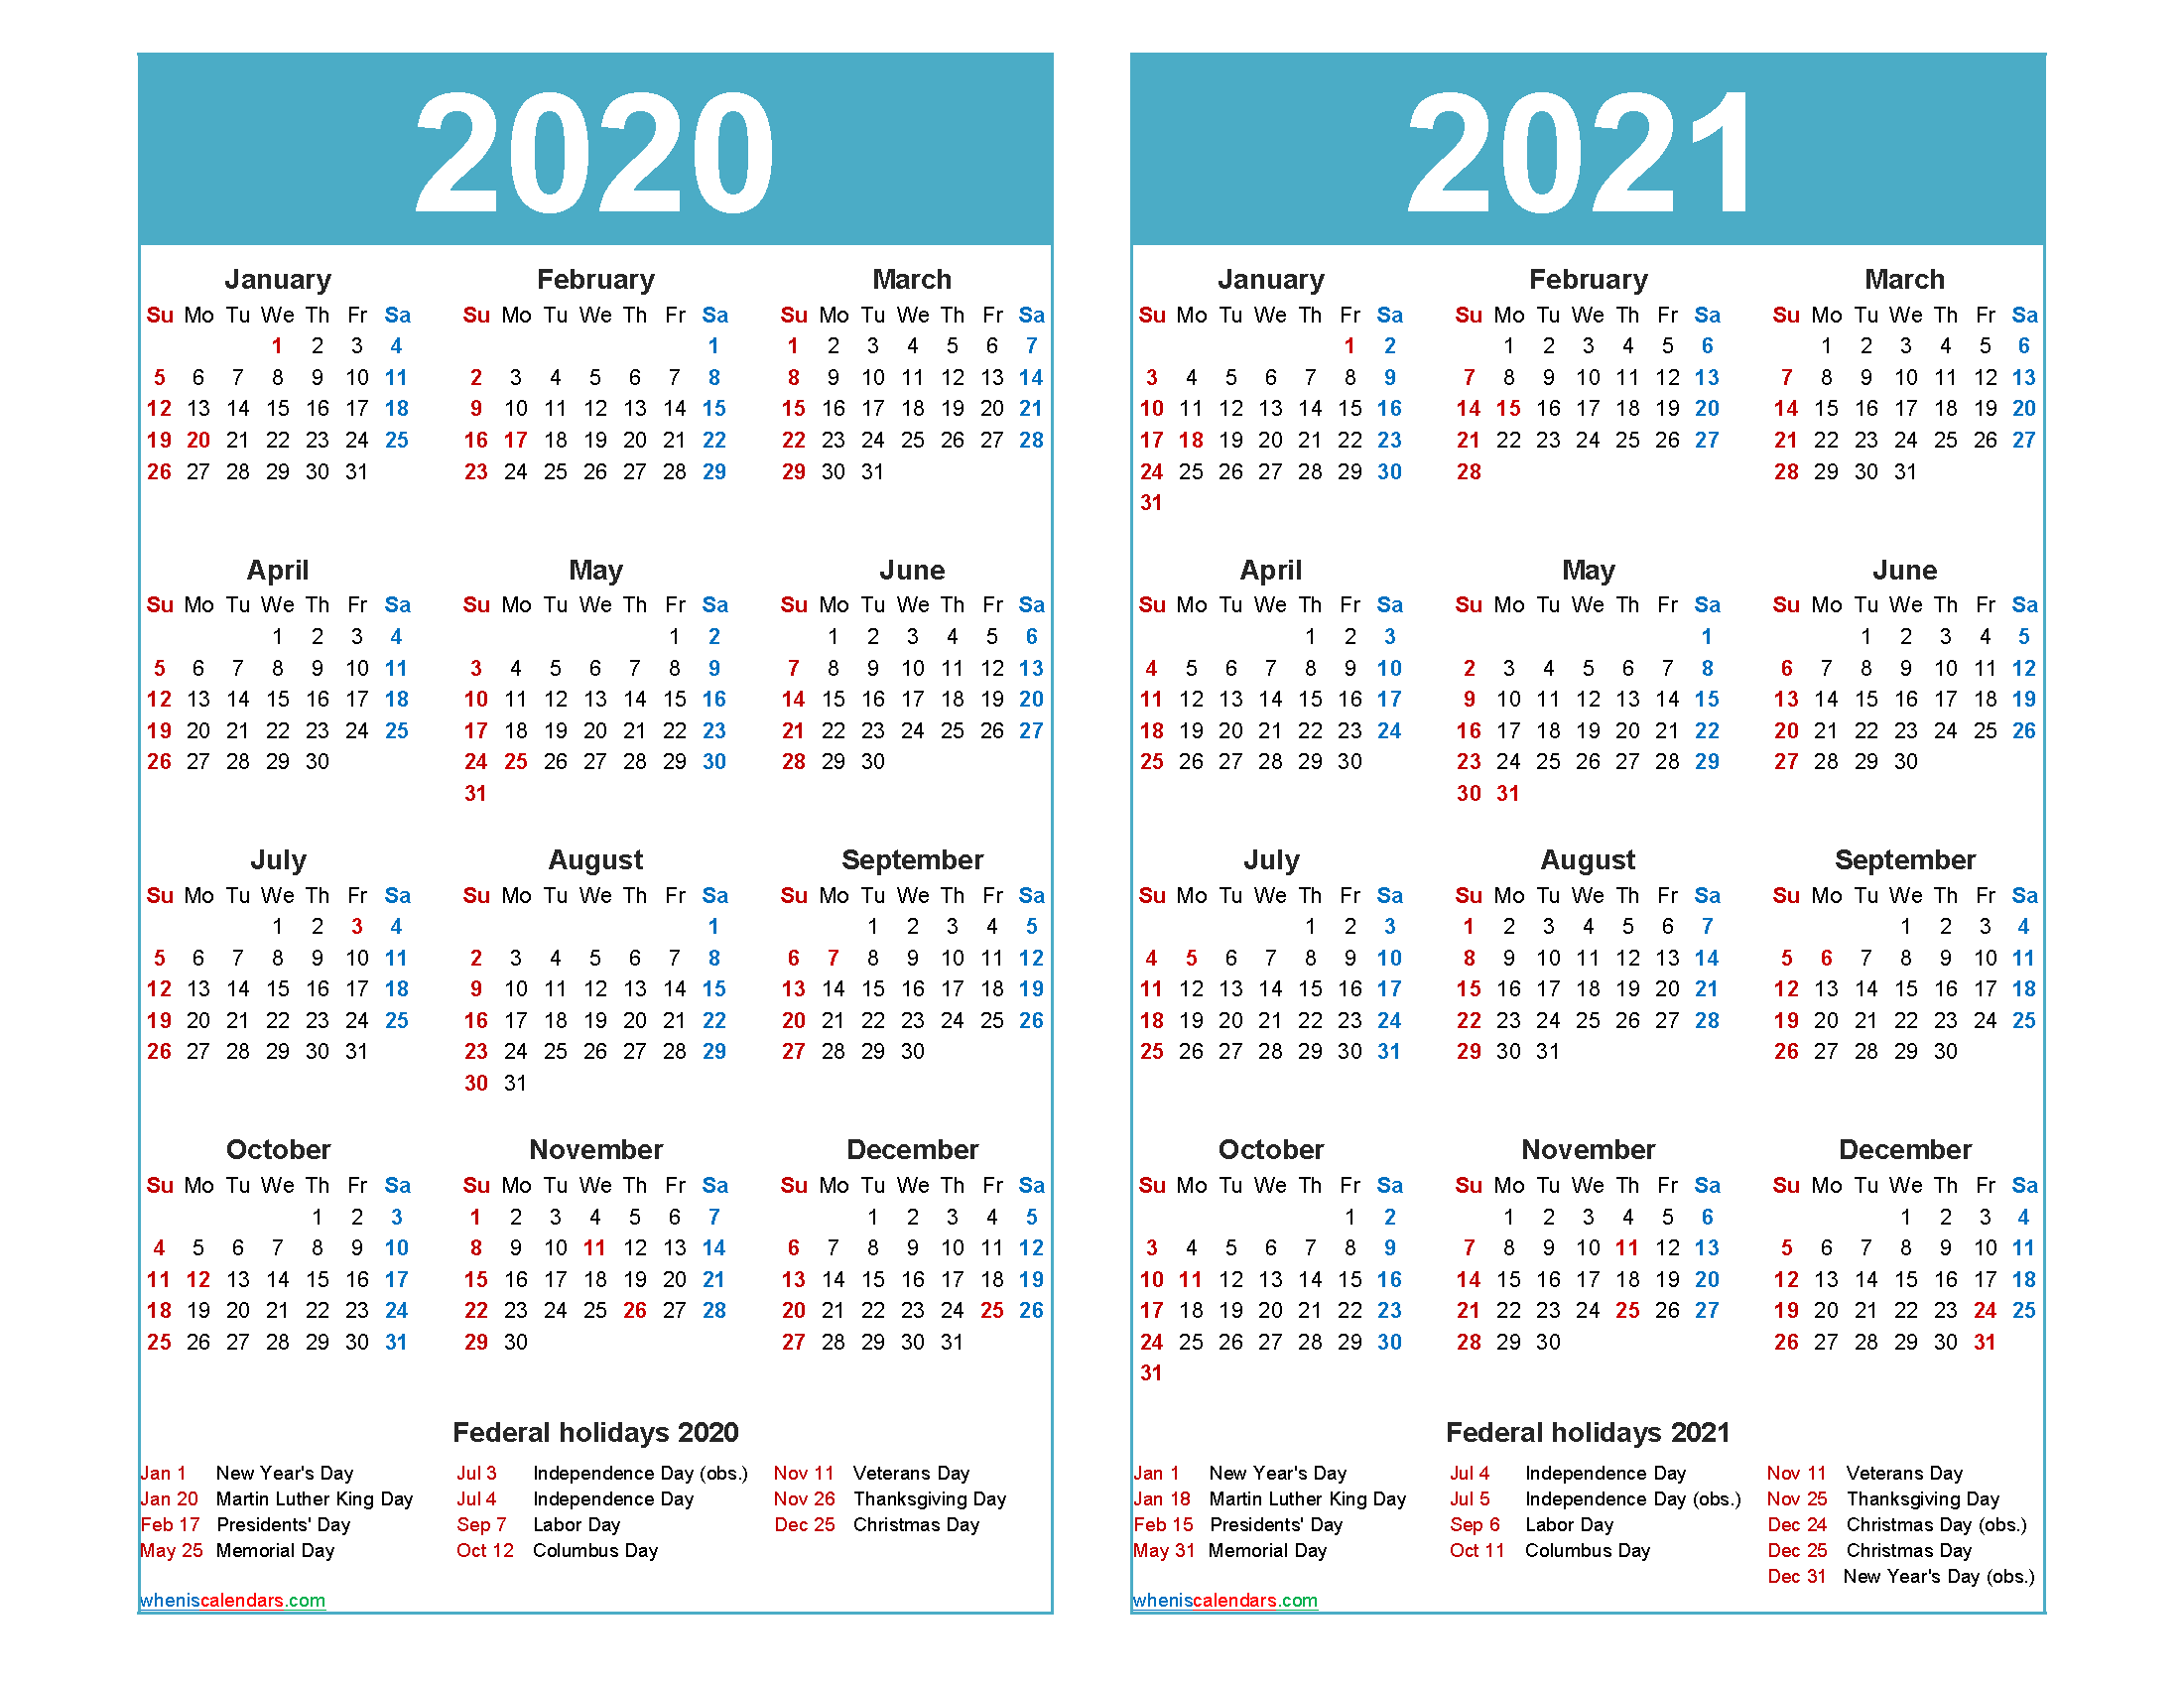 Free 2020 2021 Calendar Printable with Holidays